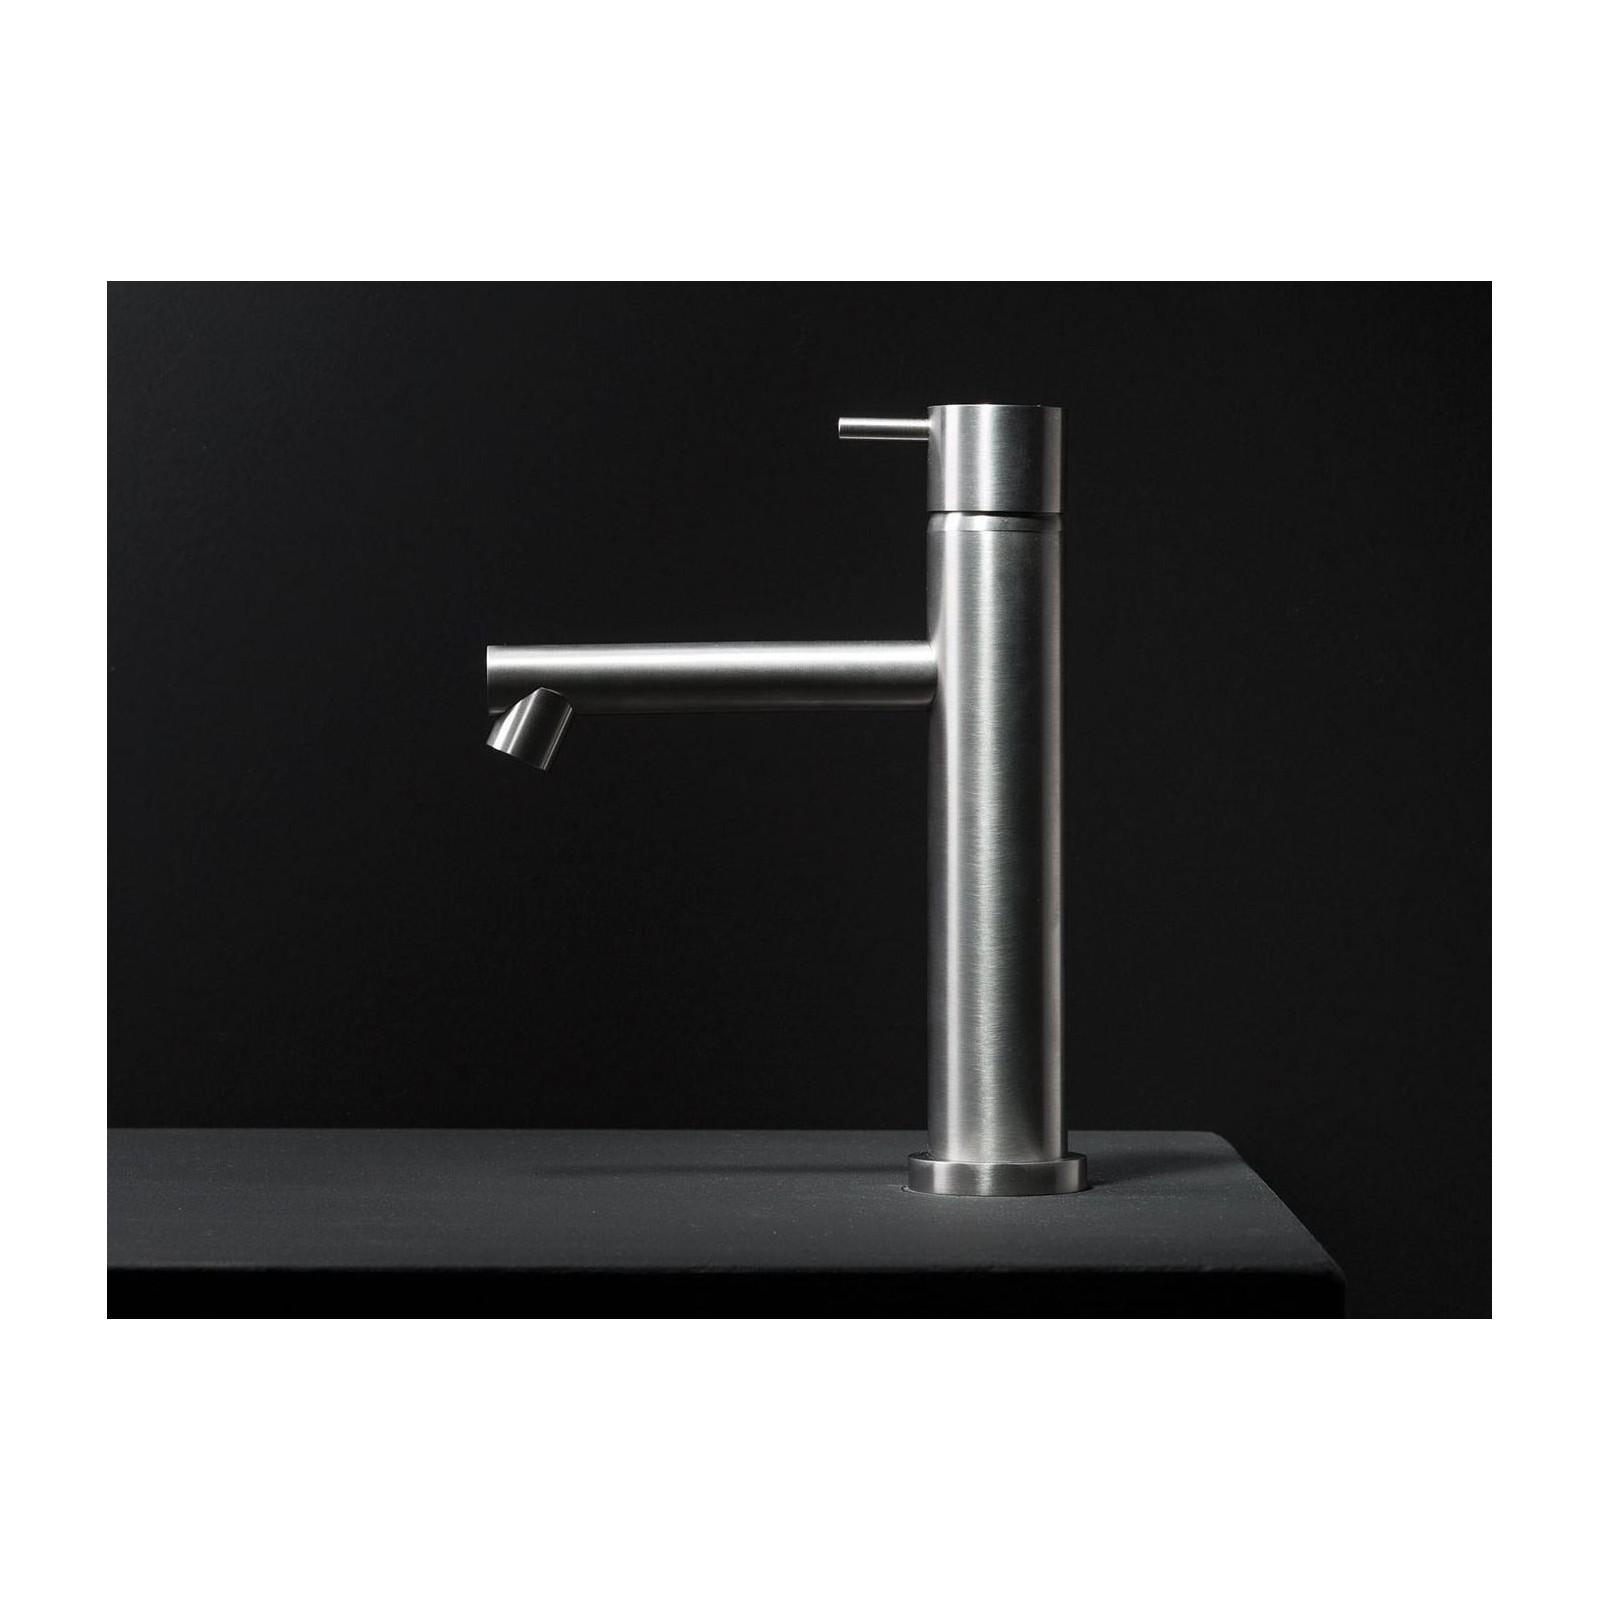 Diametro 35 Inox rubinetterie by Ritmonio - contecom